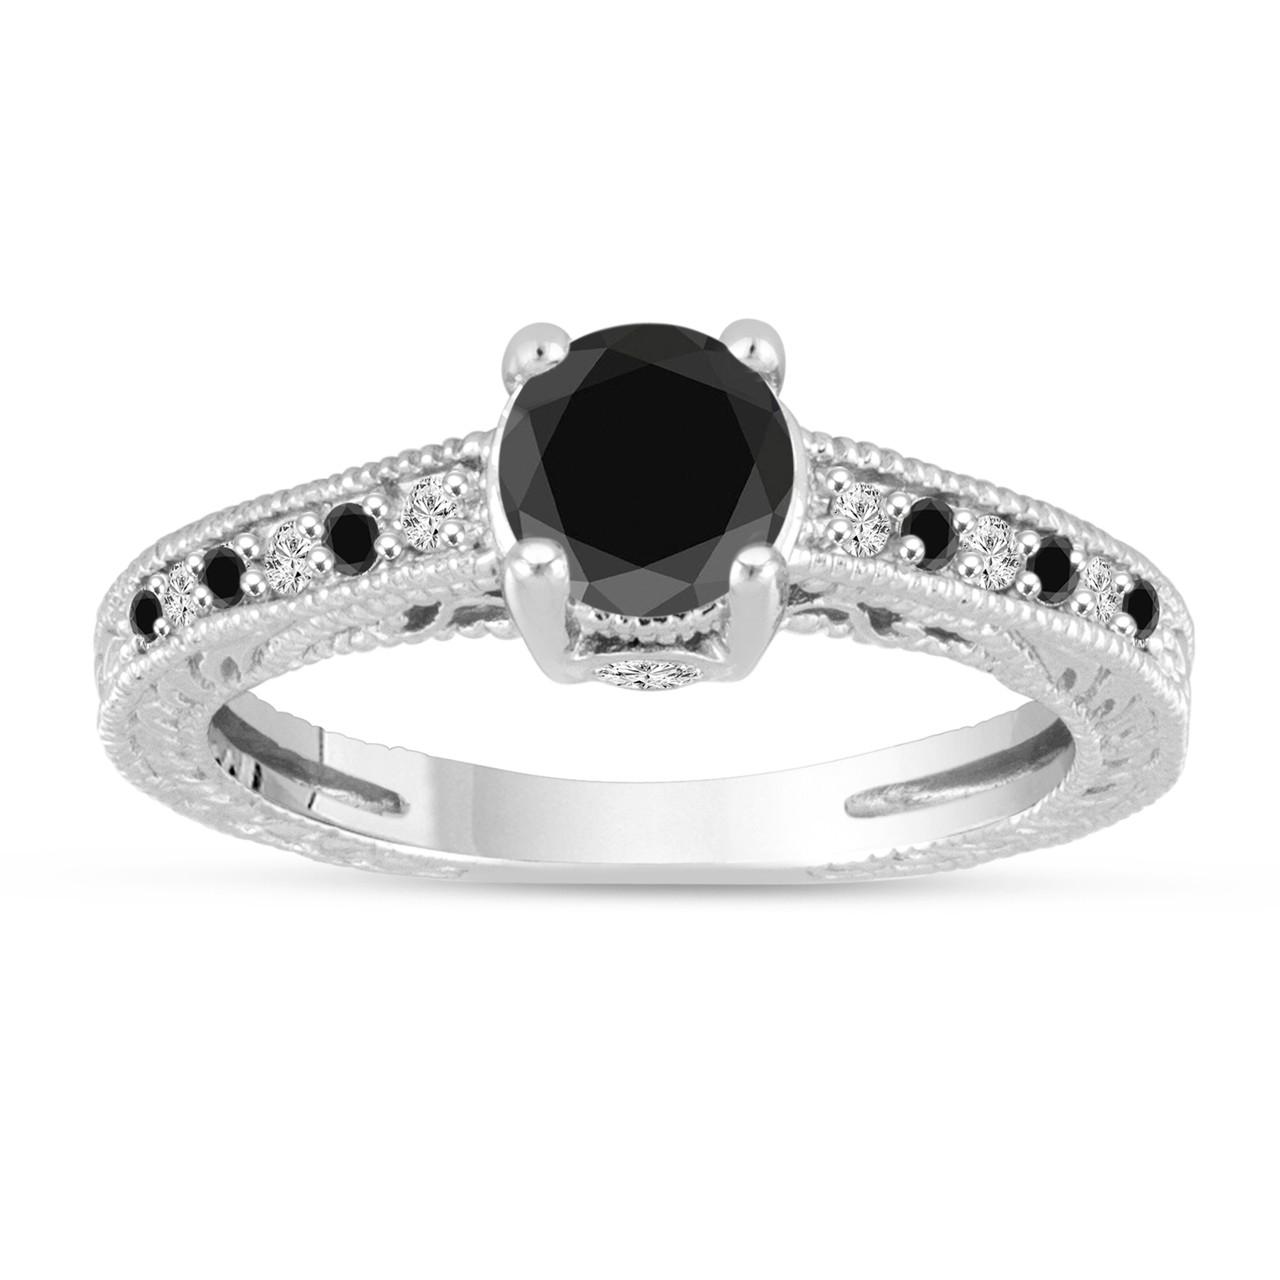 Antique Style 4 2mm Platinum Men S Wedding Band With: Platinum Black And White Diamonds Engagement Ring Vintage